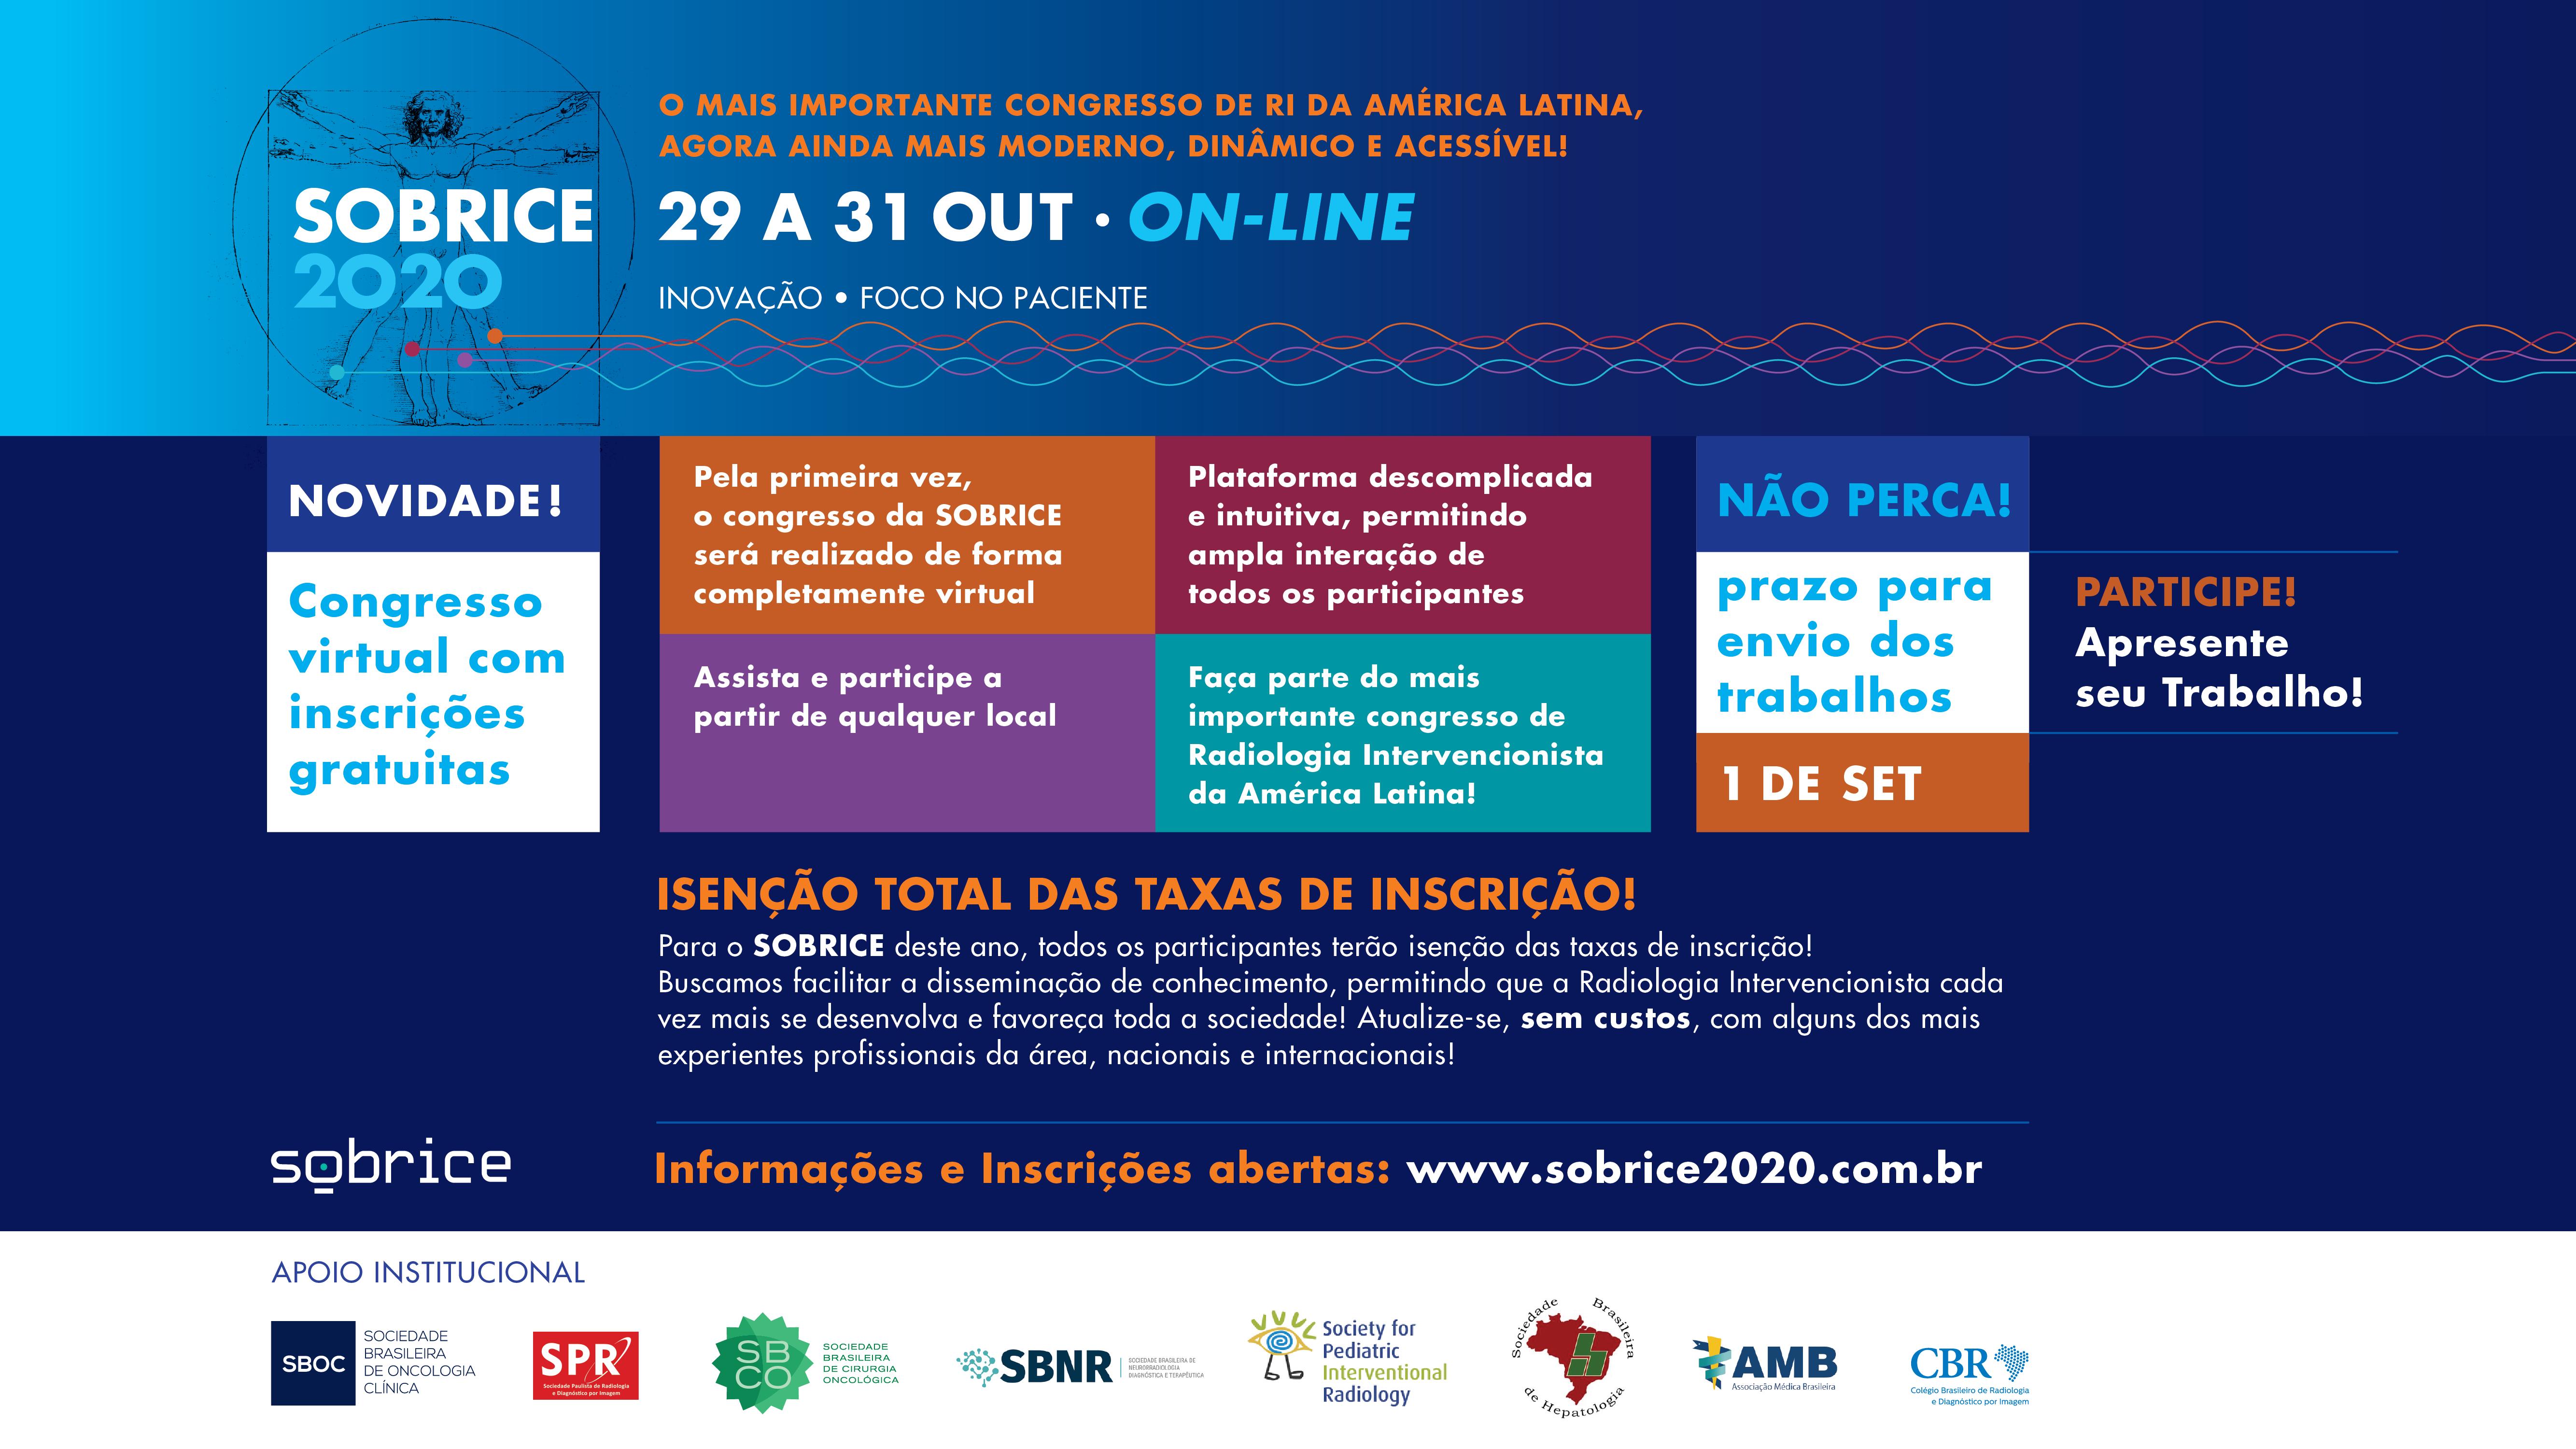 23º Congresso da SOBRICE - Sociedade Brasileira de Radiologia Intervencionista e Cirurgia Endovascular